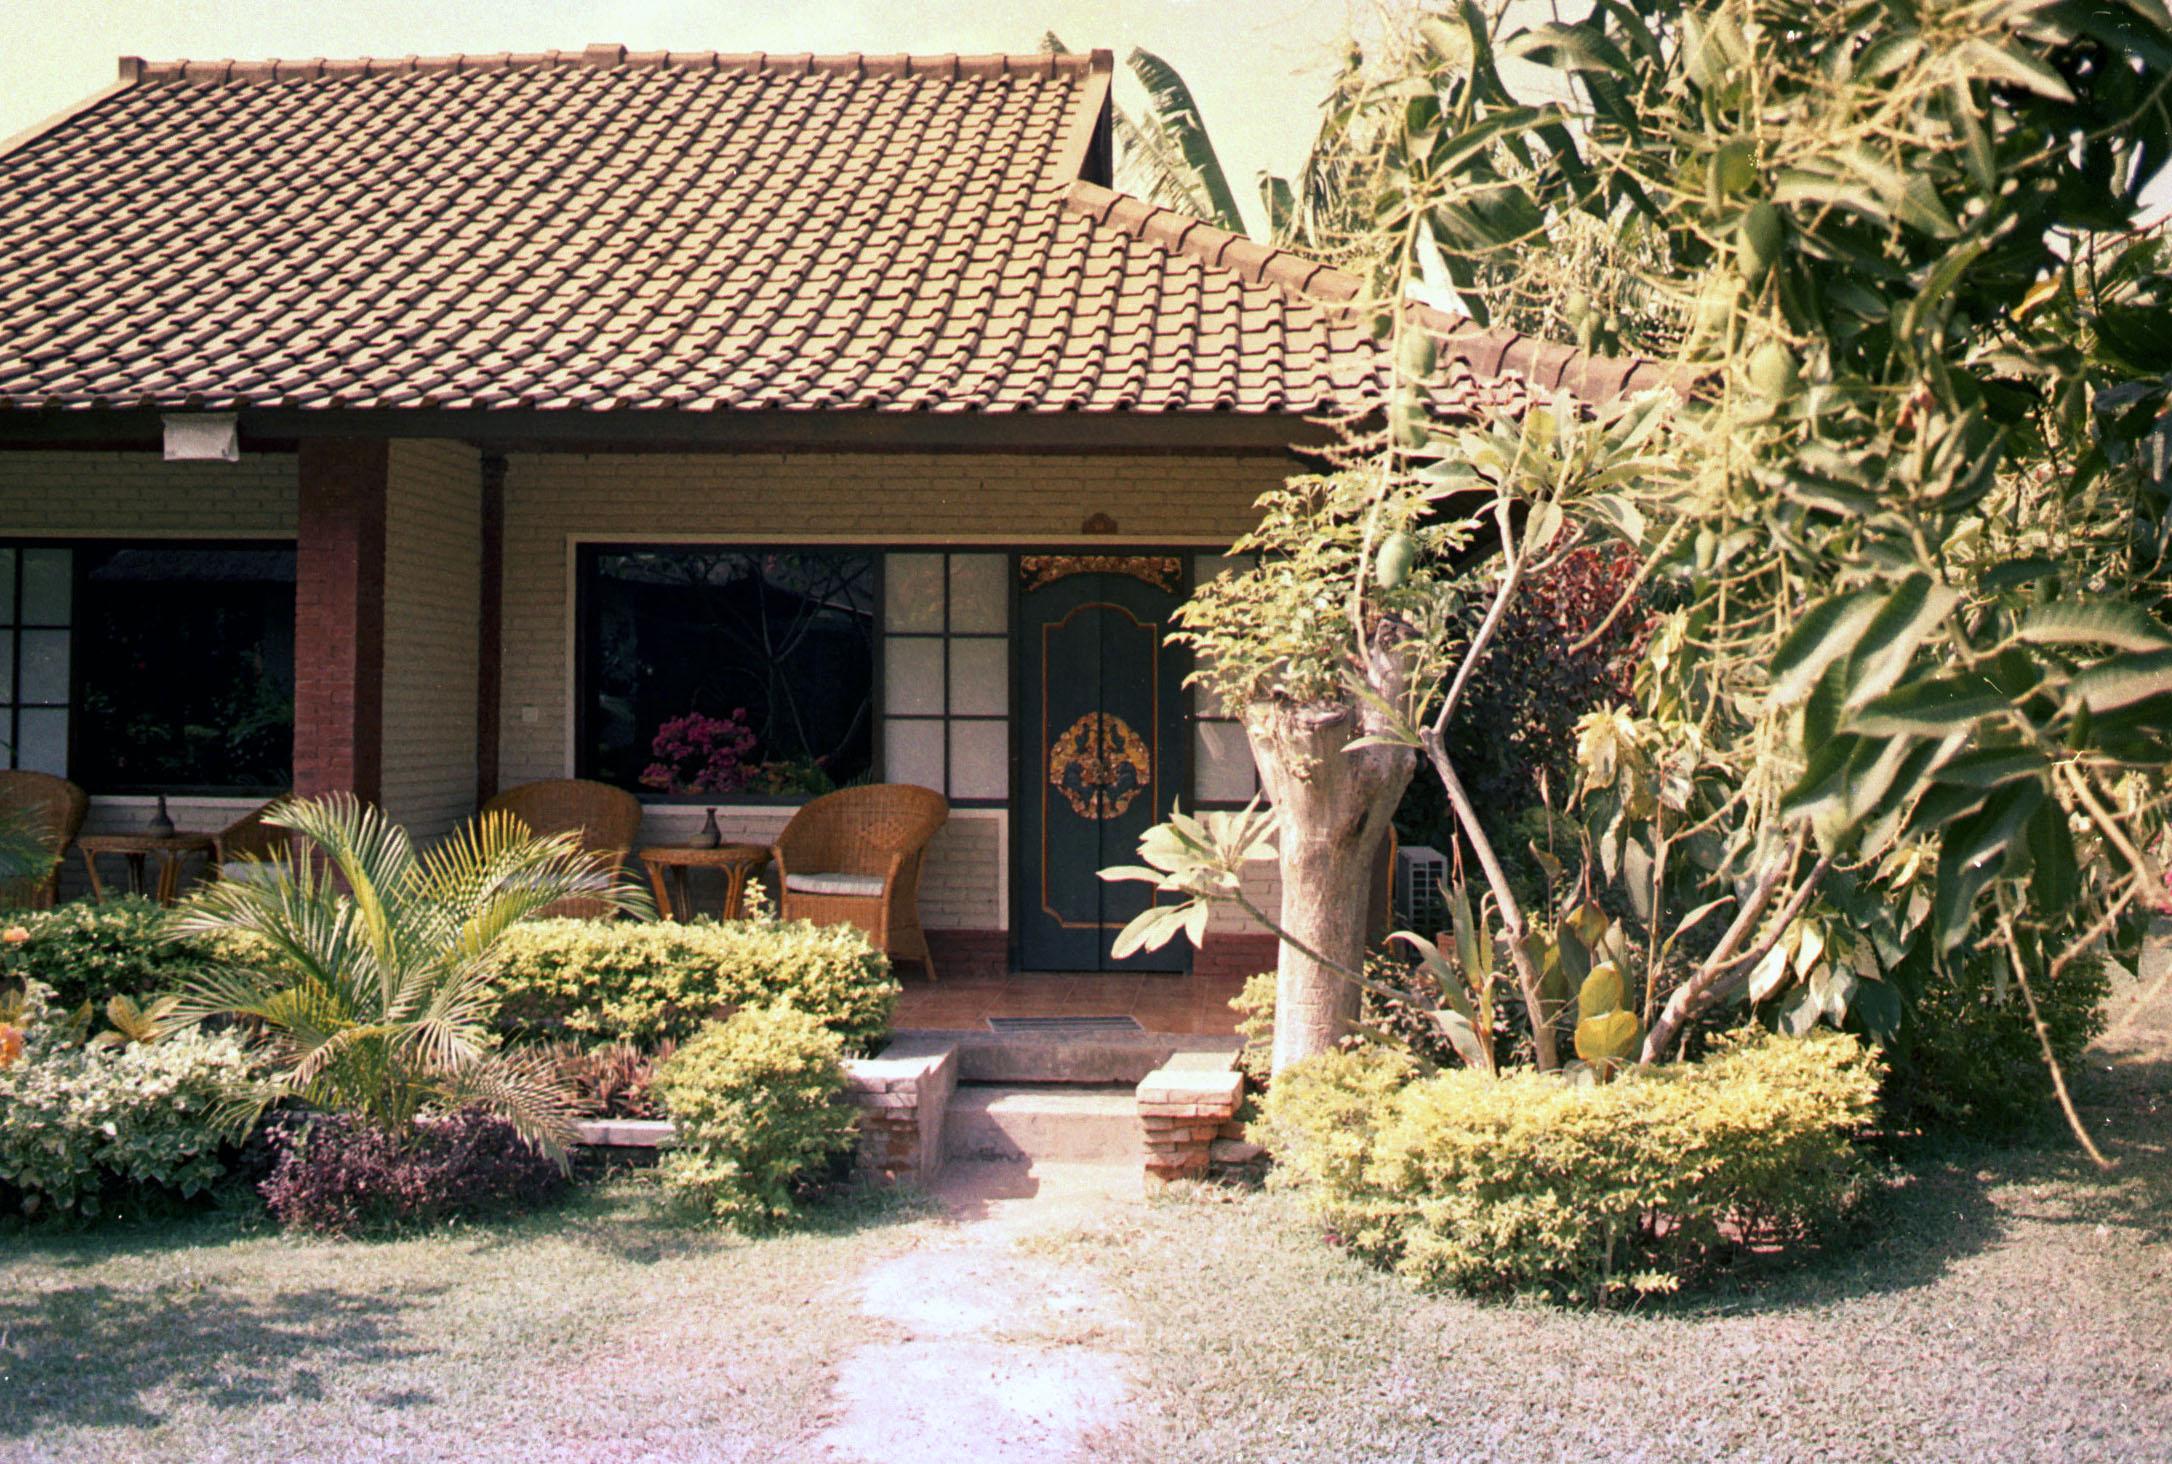 Modern nipa hut design joy studio design gallery best for Modern nipa hut house design